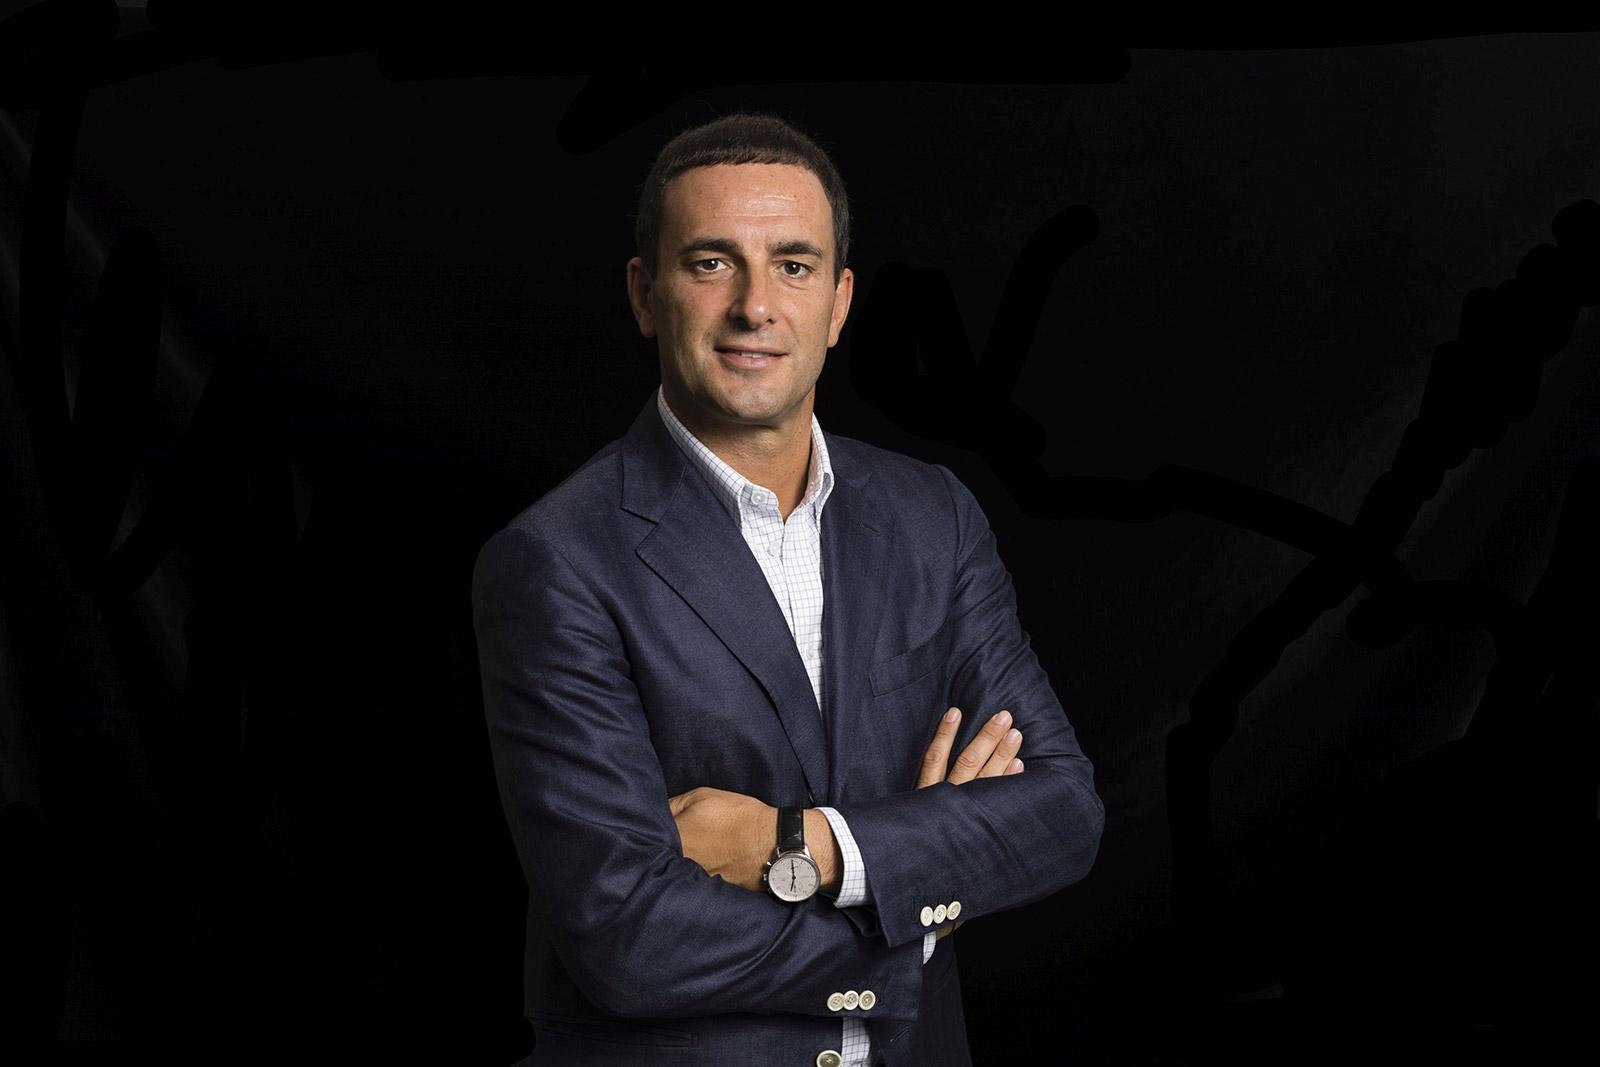 Fabio Boschi, Futura Chairman.